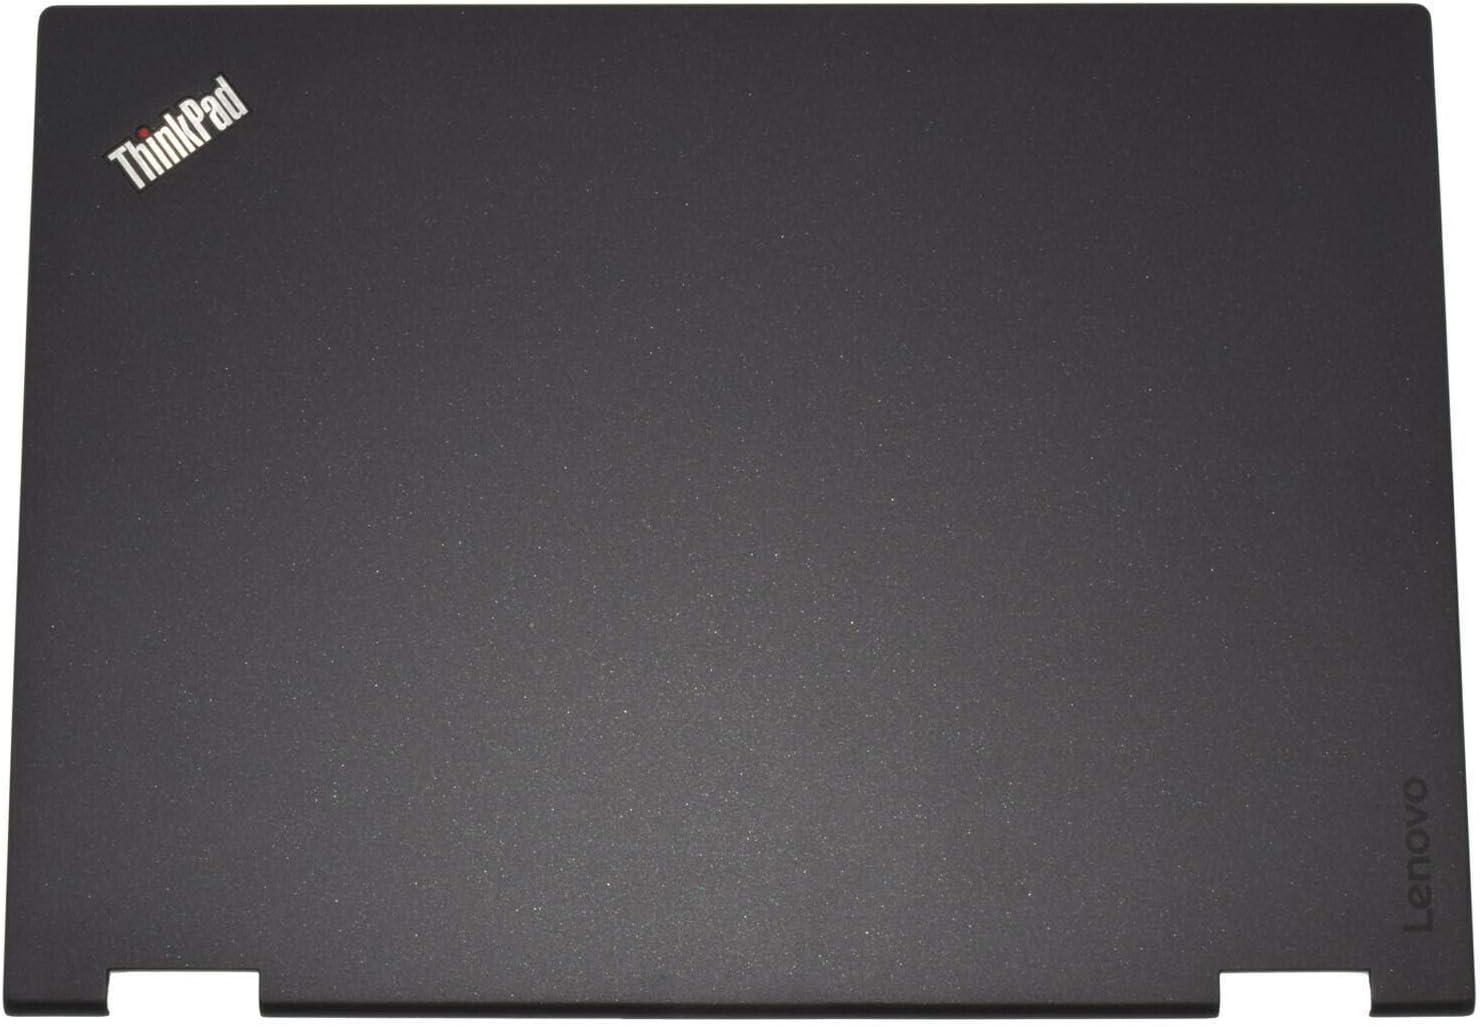 1920x1080 Touch Digitizer JYLTK New Genuine 15.6 FHD Bezel Frame PCB Assembly for Lenovo Yoga 710-15IKB 80V5 80V50010US 5D10M14145 N156HCA-EA1 LCD Screen LED Display